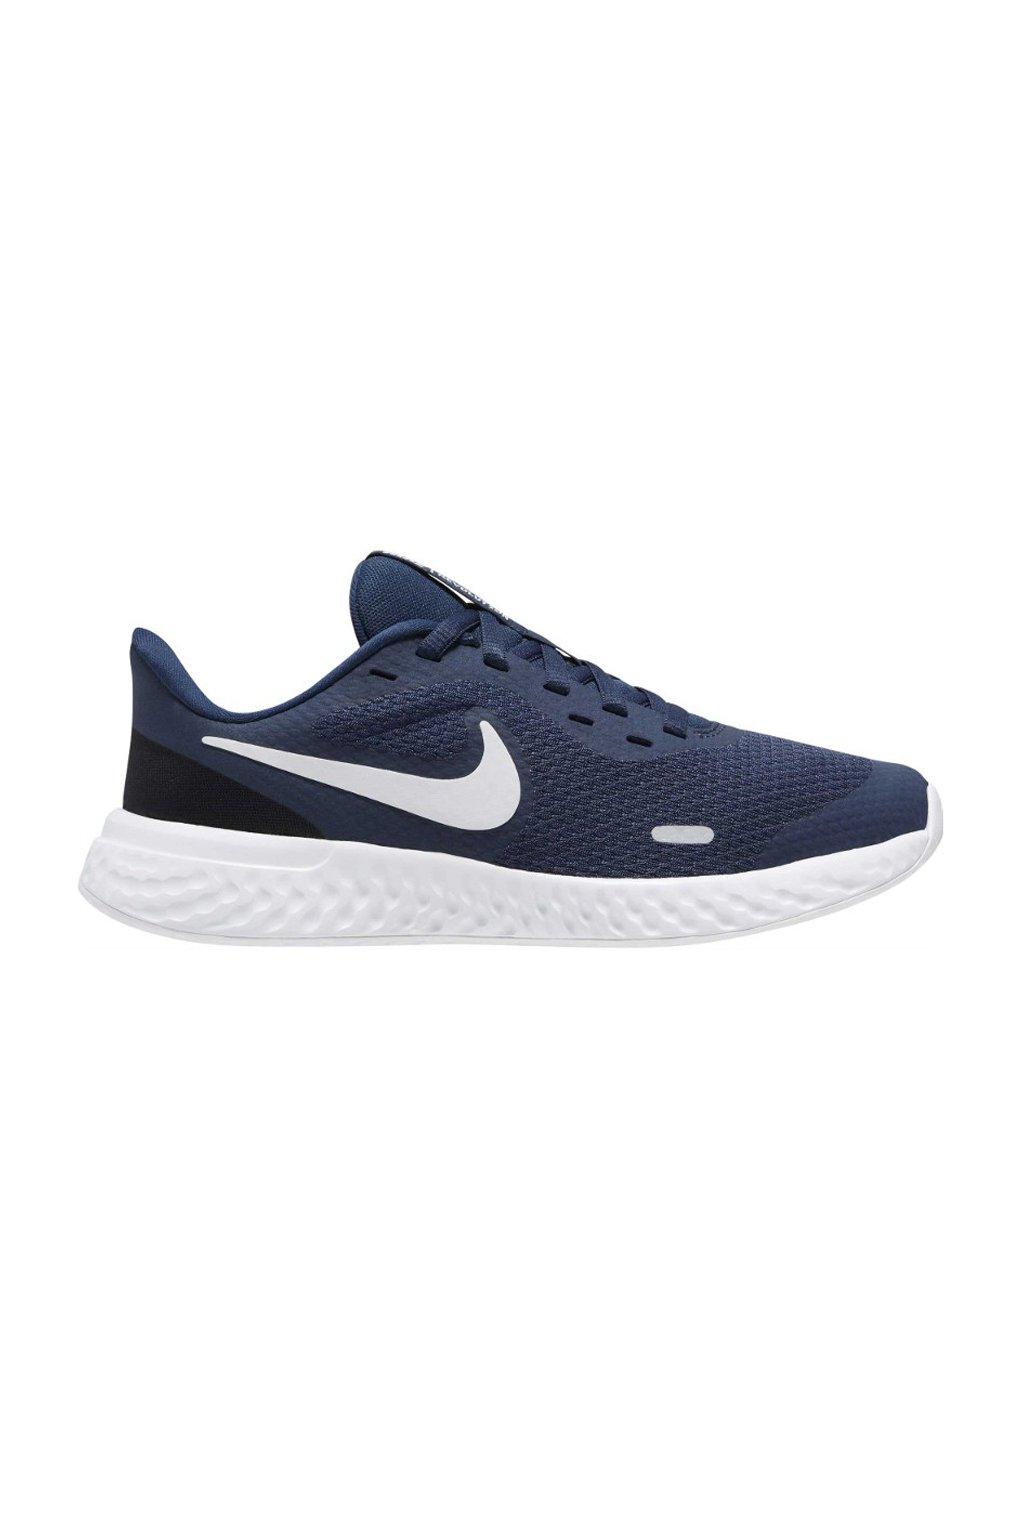 Buty do biegania Nike Revolution 5 granatowe BQ5671 402